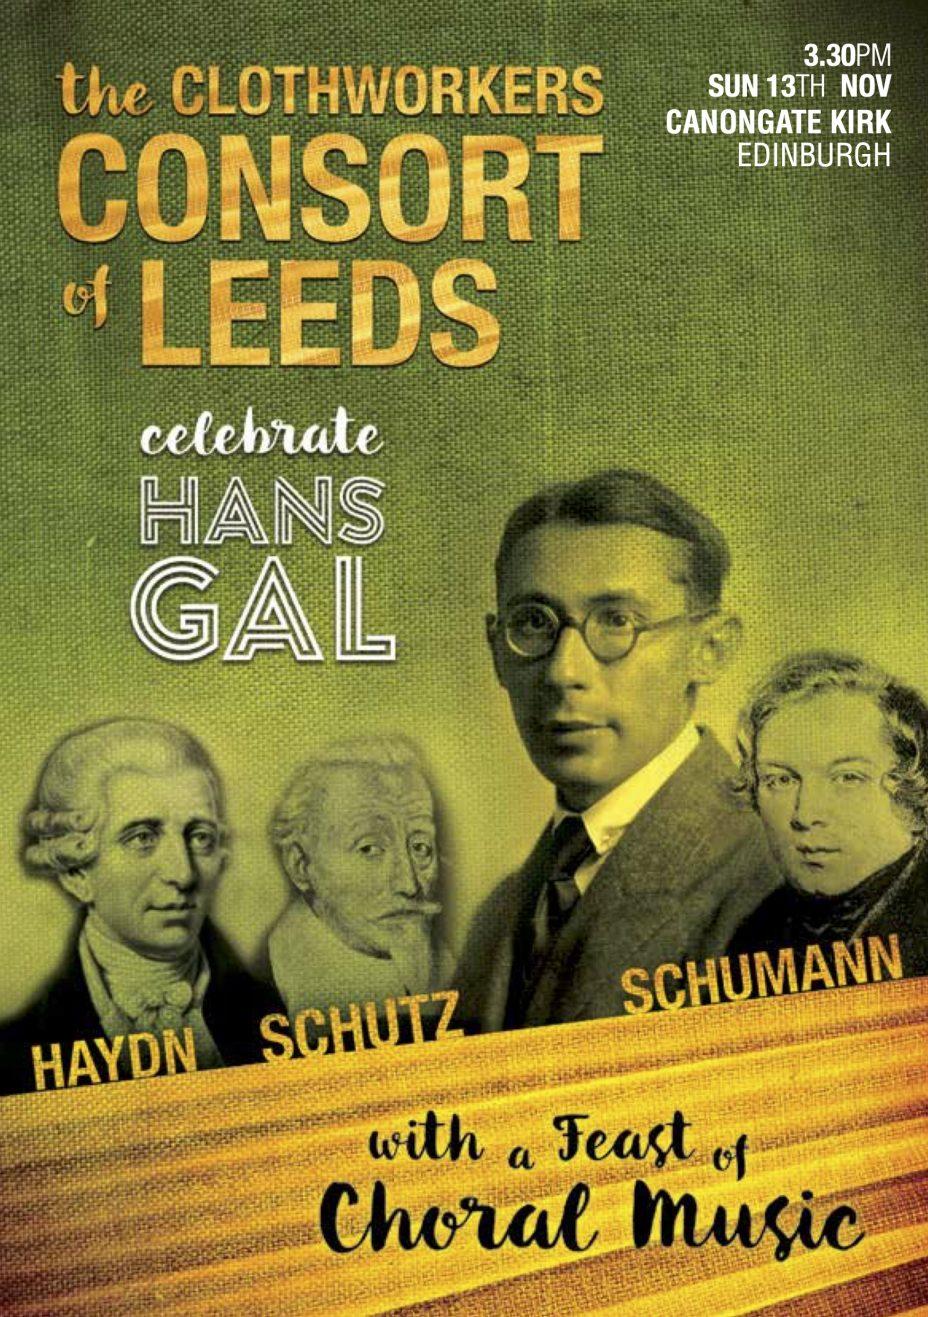 Gal Society concert, Edinburgh 2016 Poster